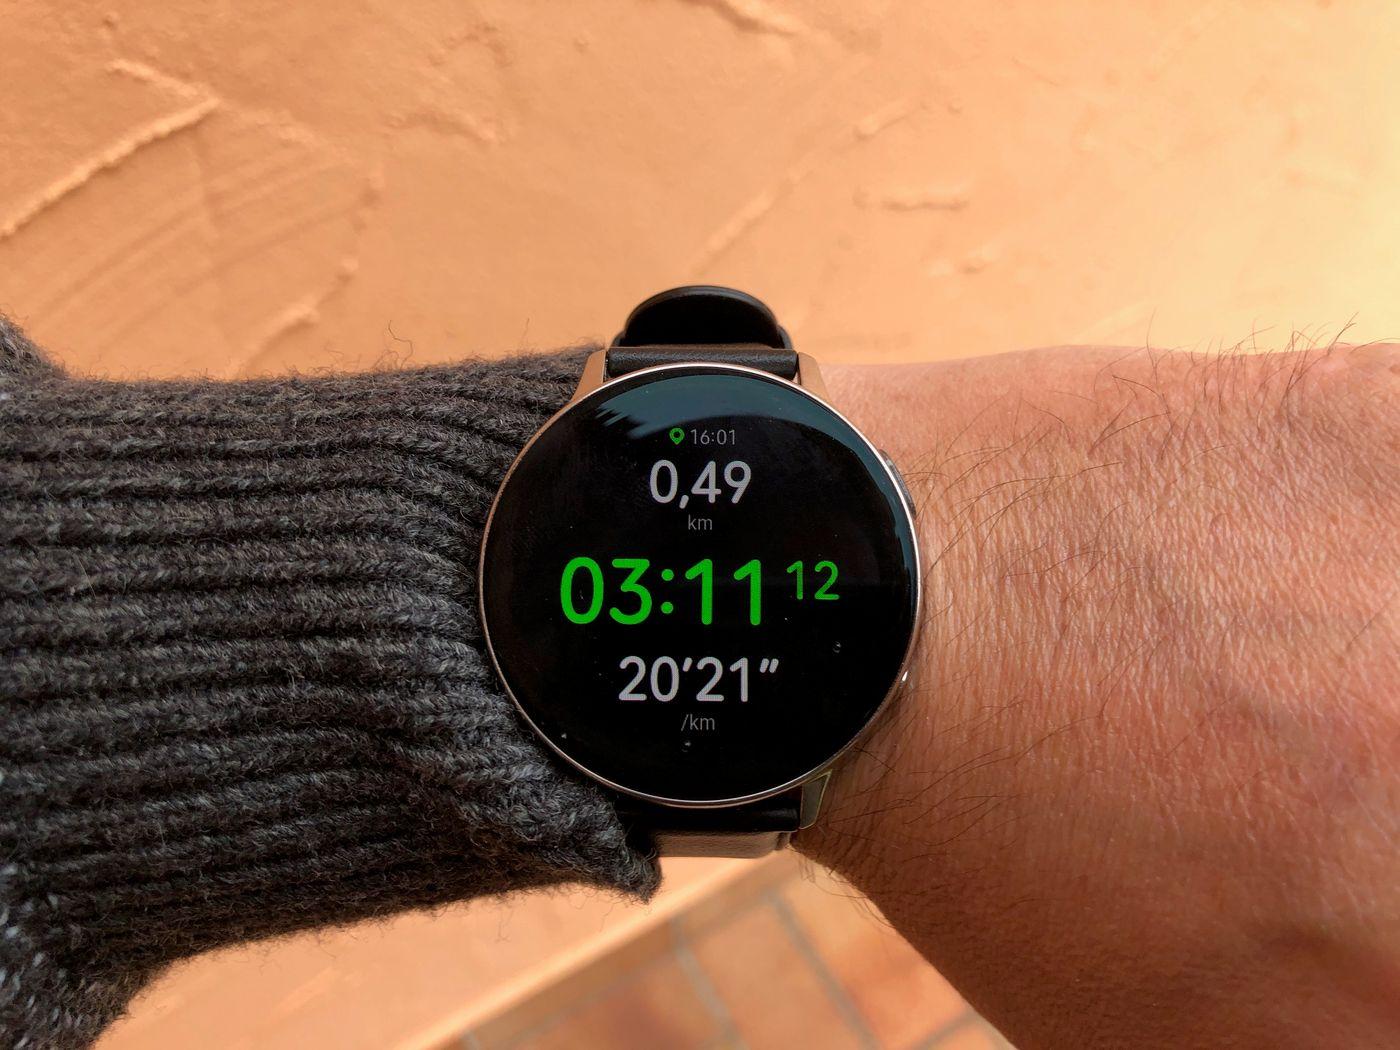 Galaxy Watch Active 2 Image 4